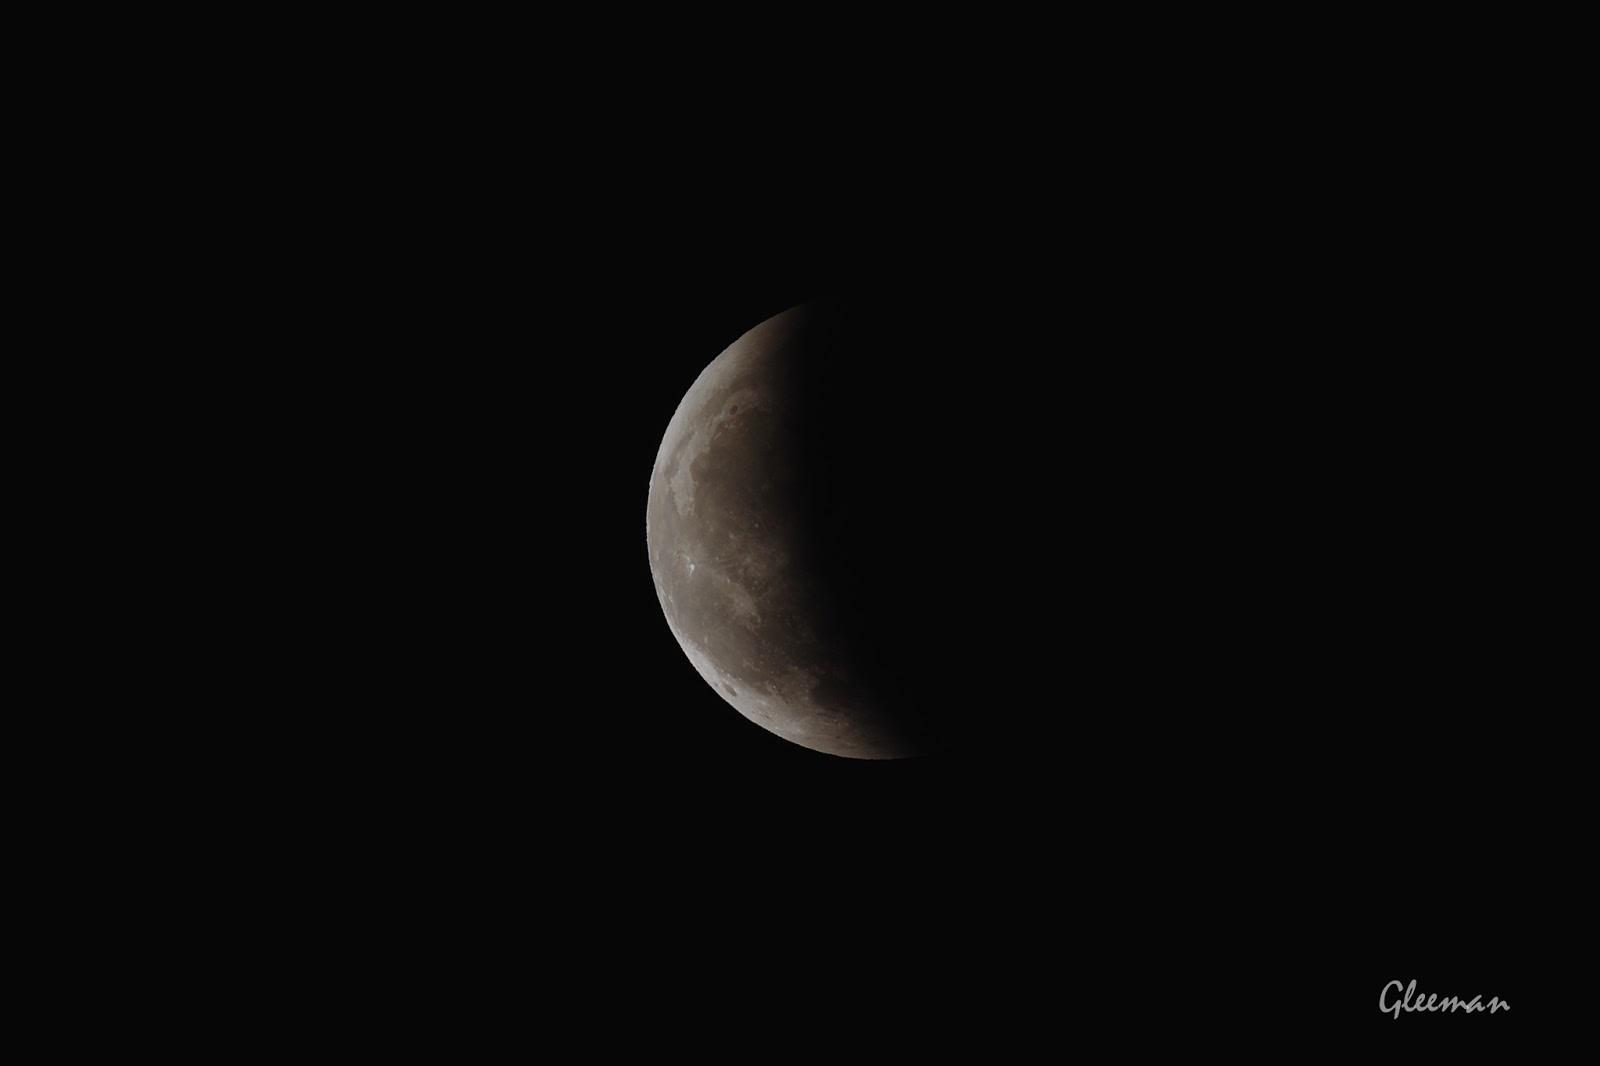 月全食與天王星衝 | Total lunar eclipse and Uranus opposition